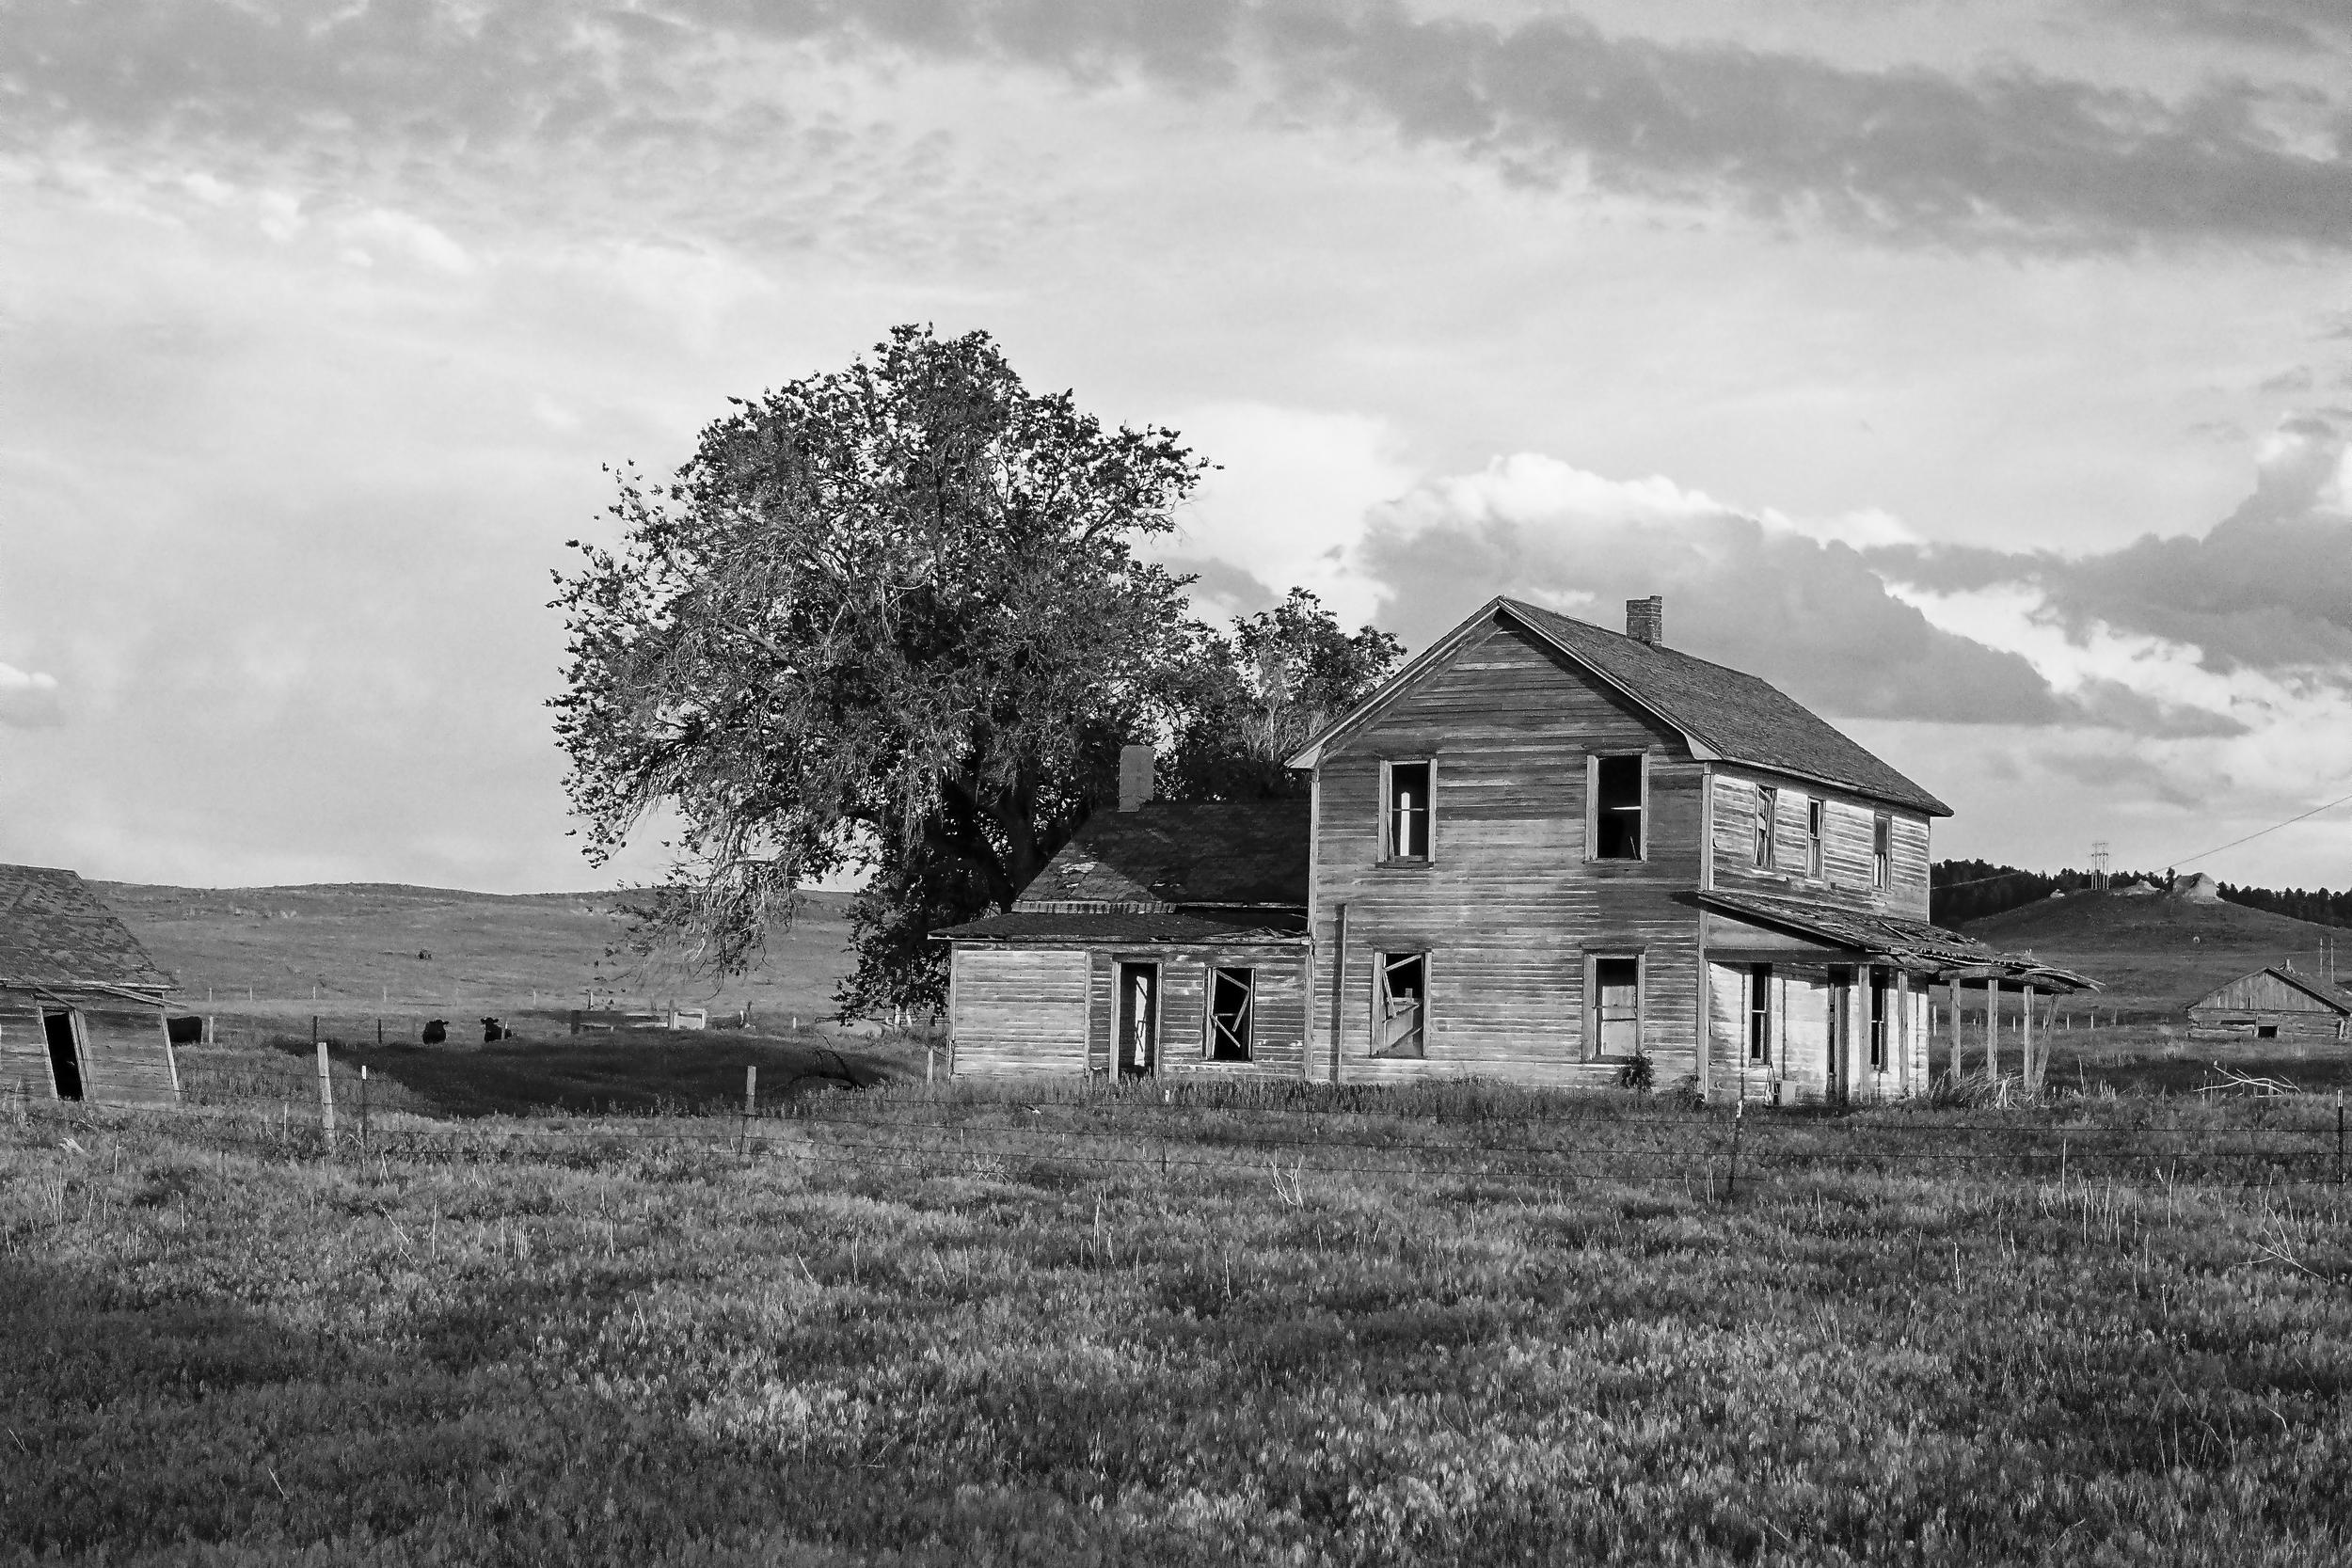 Crawford Homestead | Minolta SPxi | 50mm - Portra 400 | HW Kateley